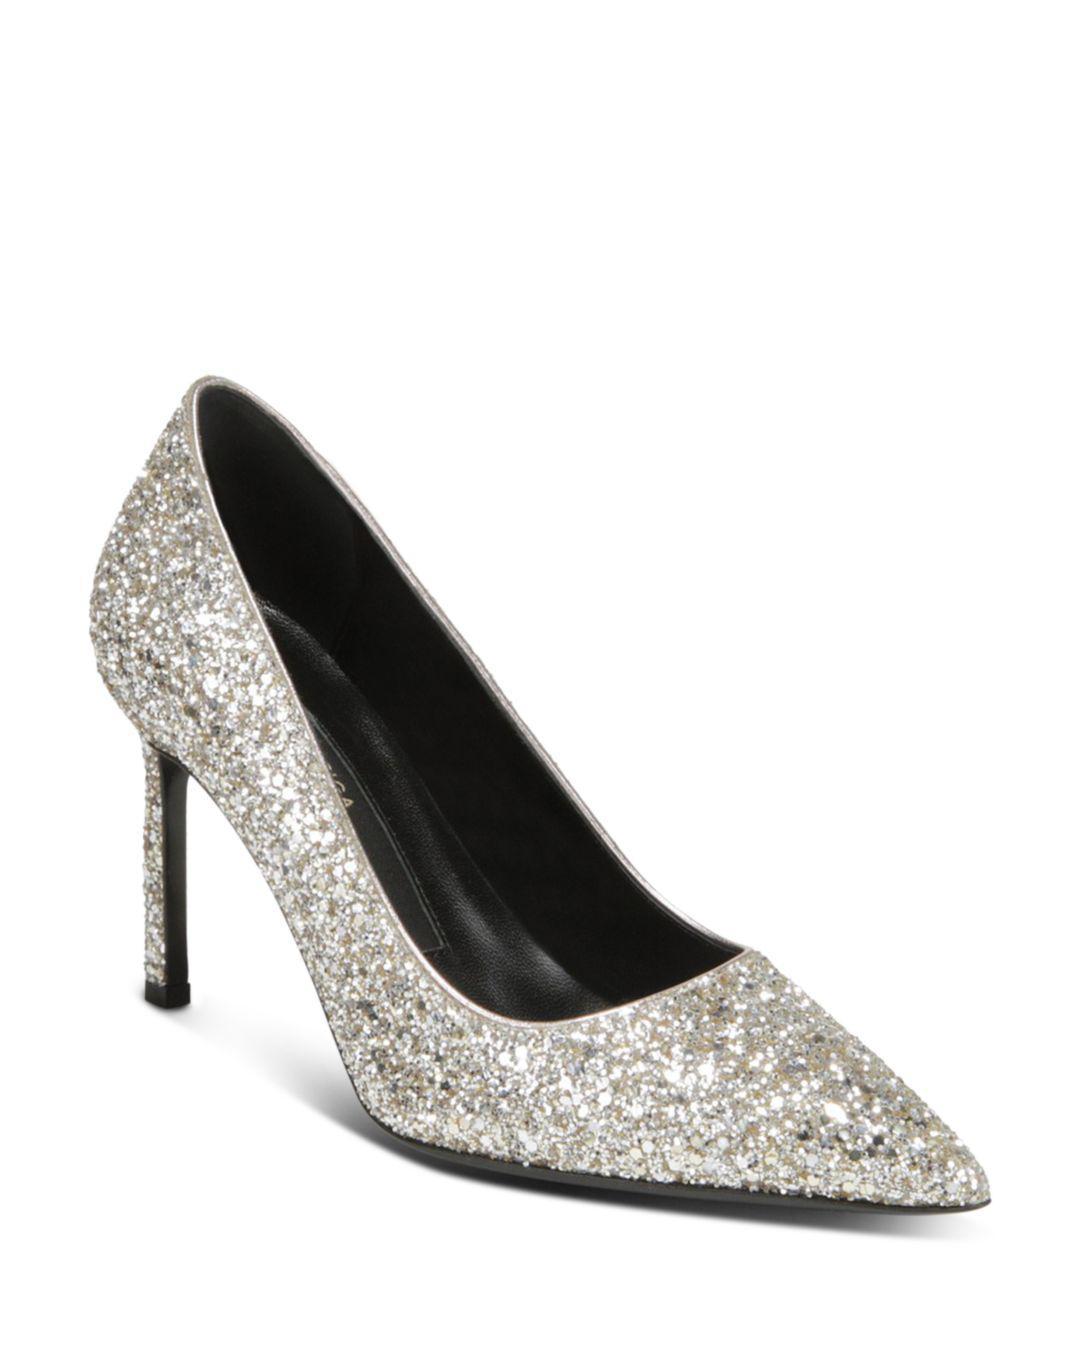 8bad3d349b4 Via Spiga Nikole 3 (silver Sand) Women s 1-2 Inch Heel Shoes in ...